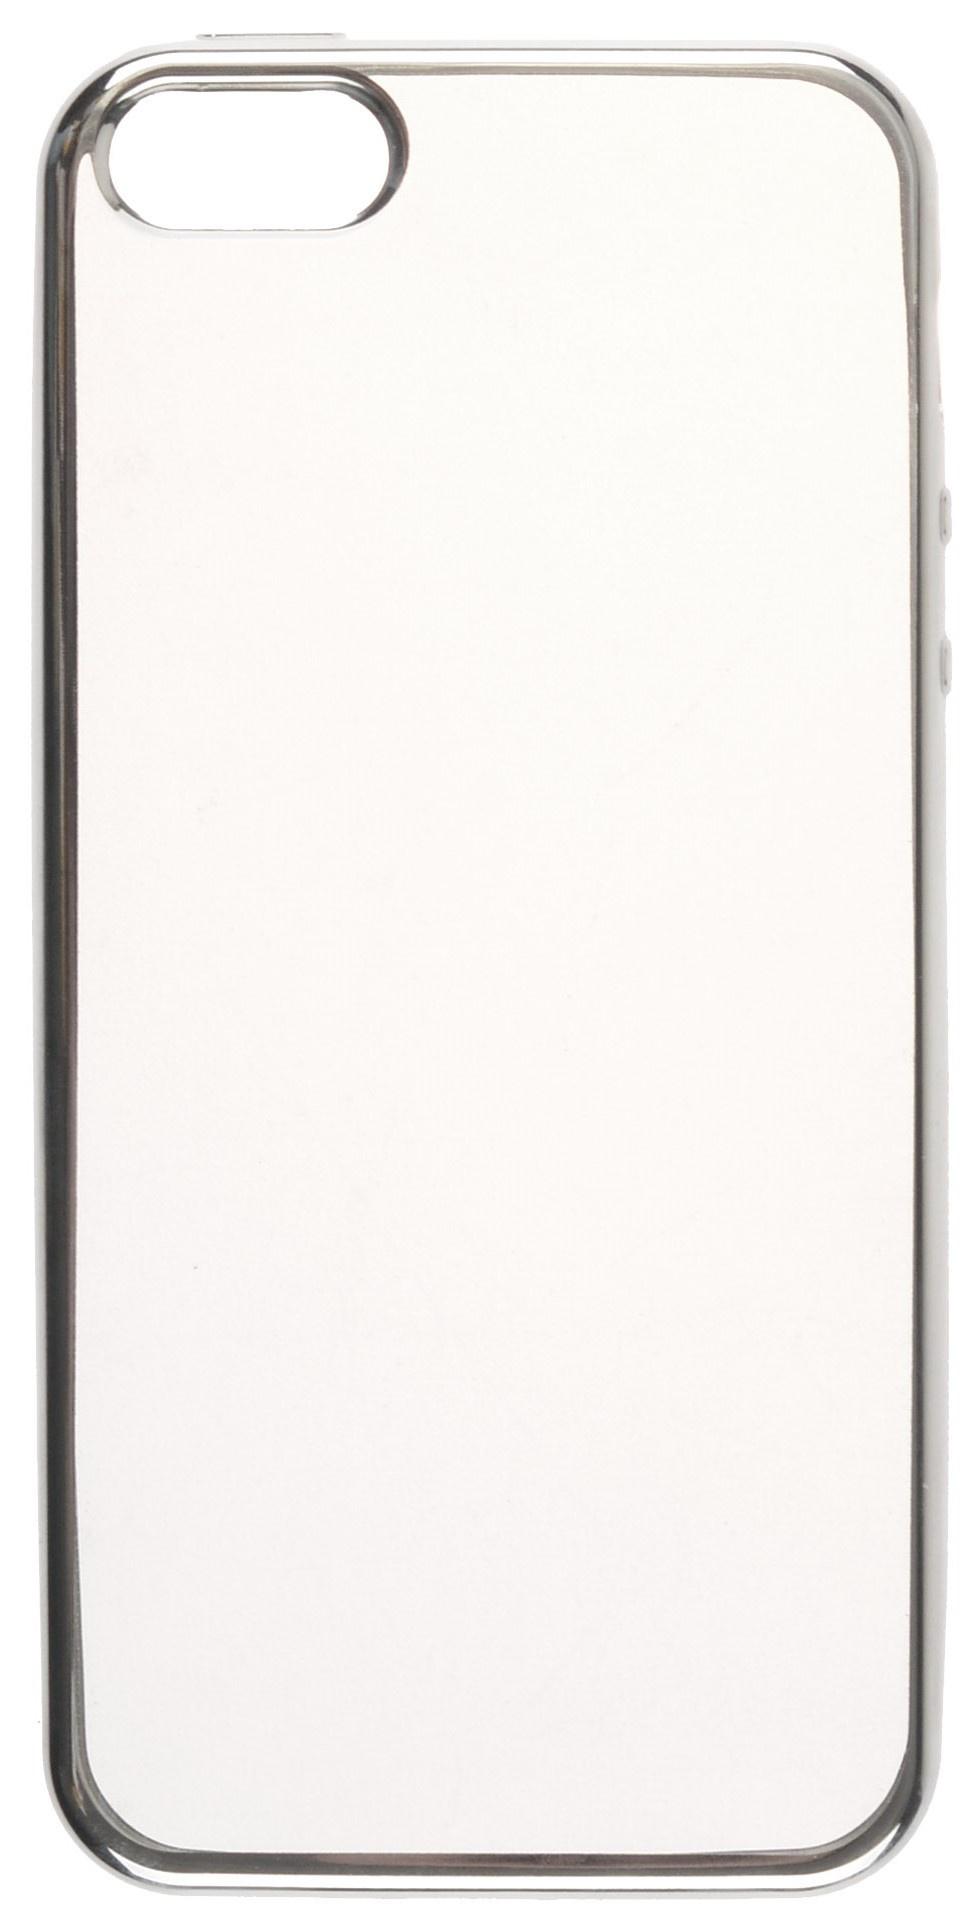 Чехол для сотового телефона skinBOX Silicone chrome border, 4660041407655, серебристый чехол для сотового телефона skinbox silicone chrome border 4660041407891 серебристый